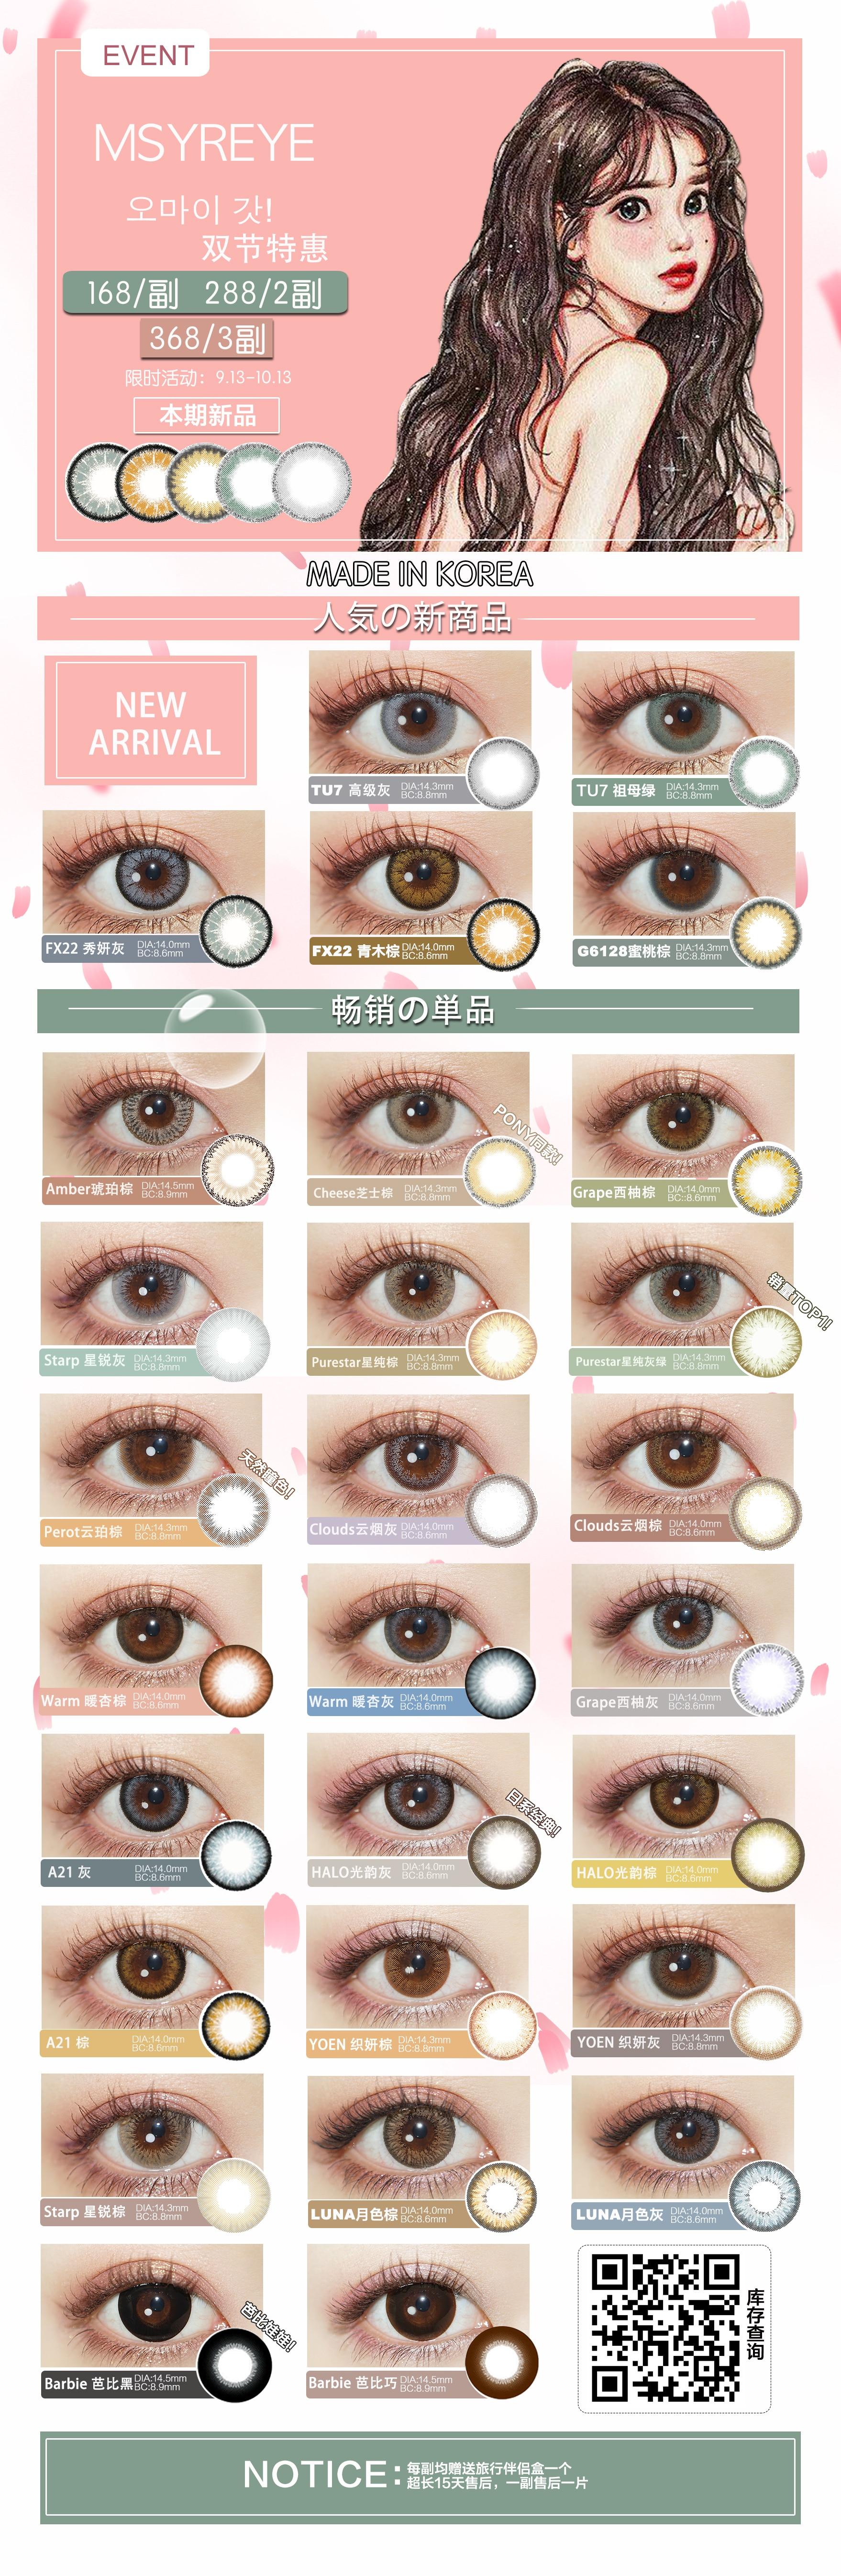 MSYREYE双节特惠 拼单只需122/副-万视美瞳